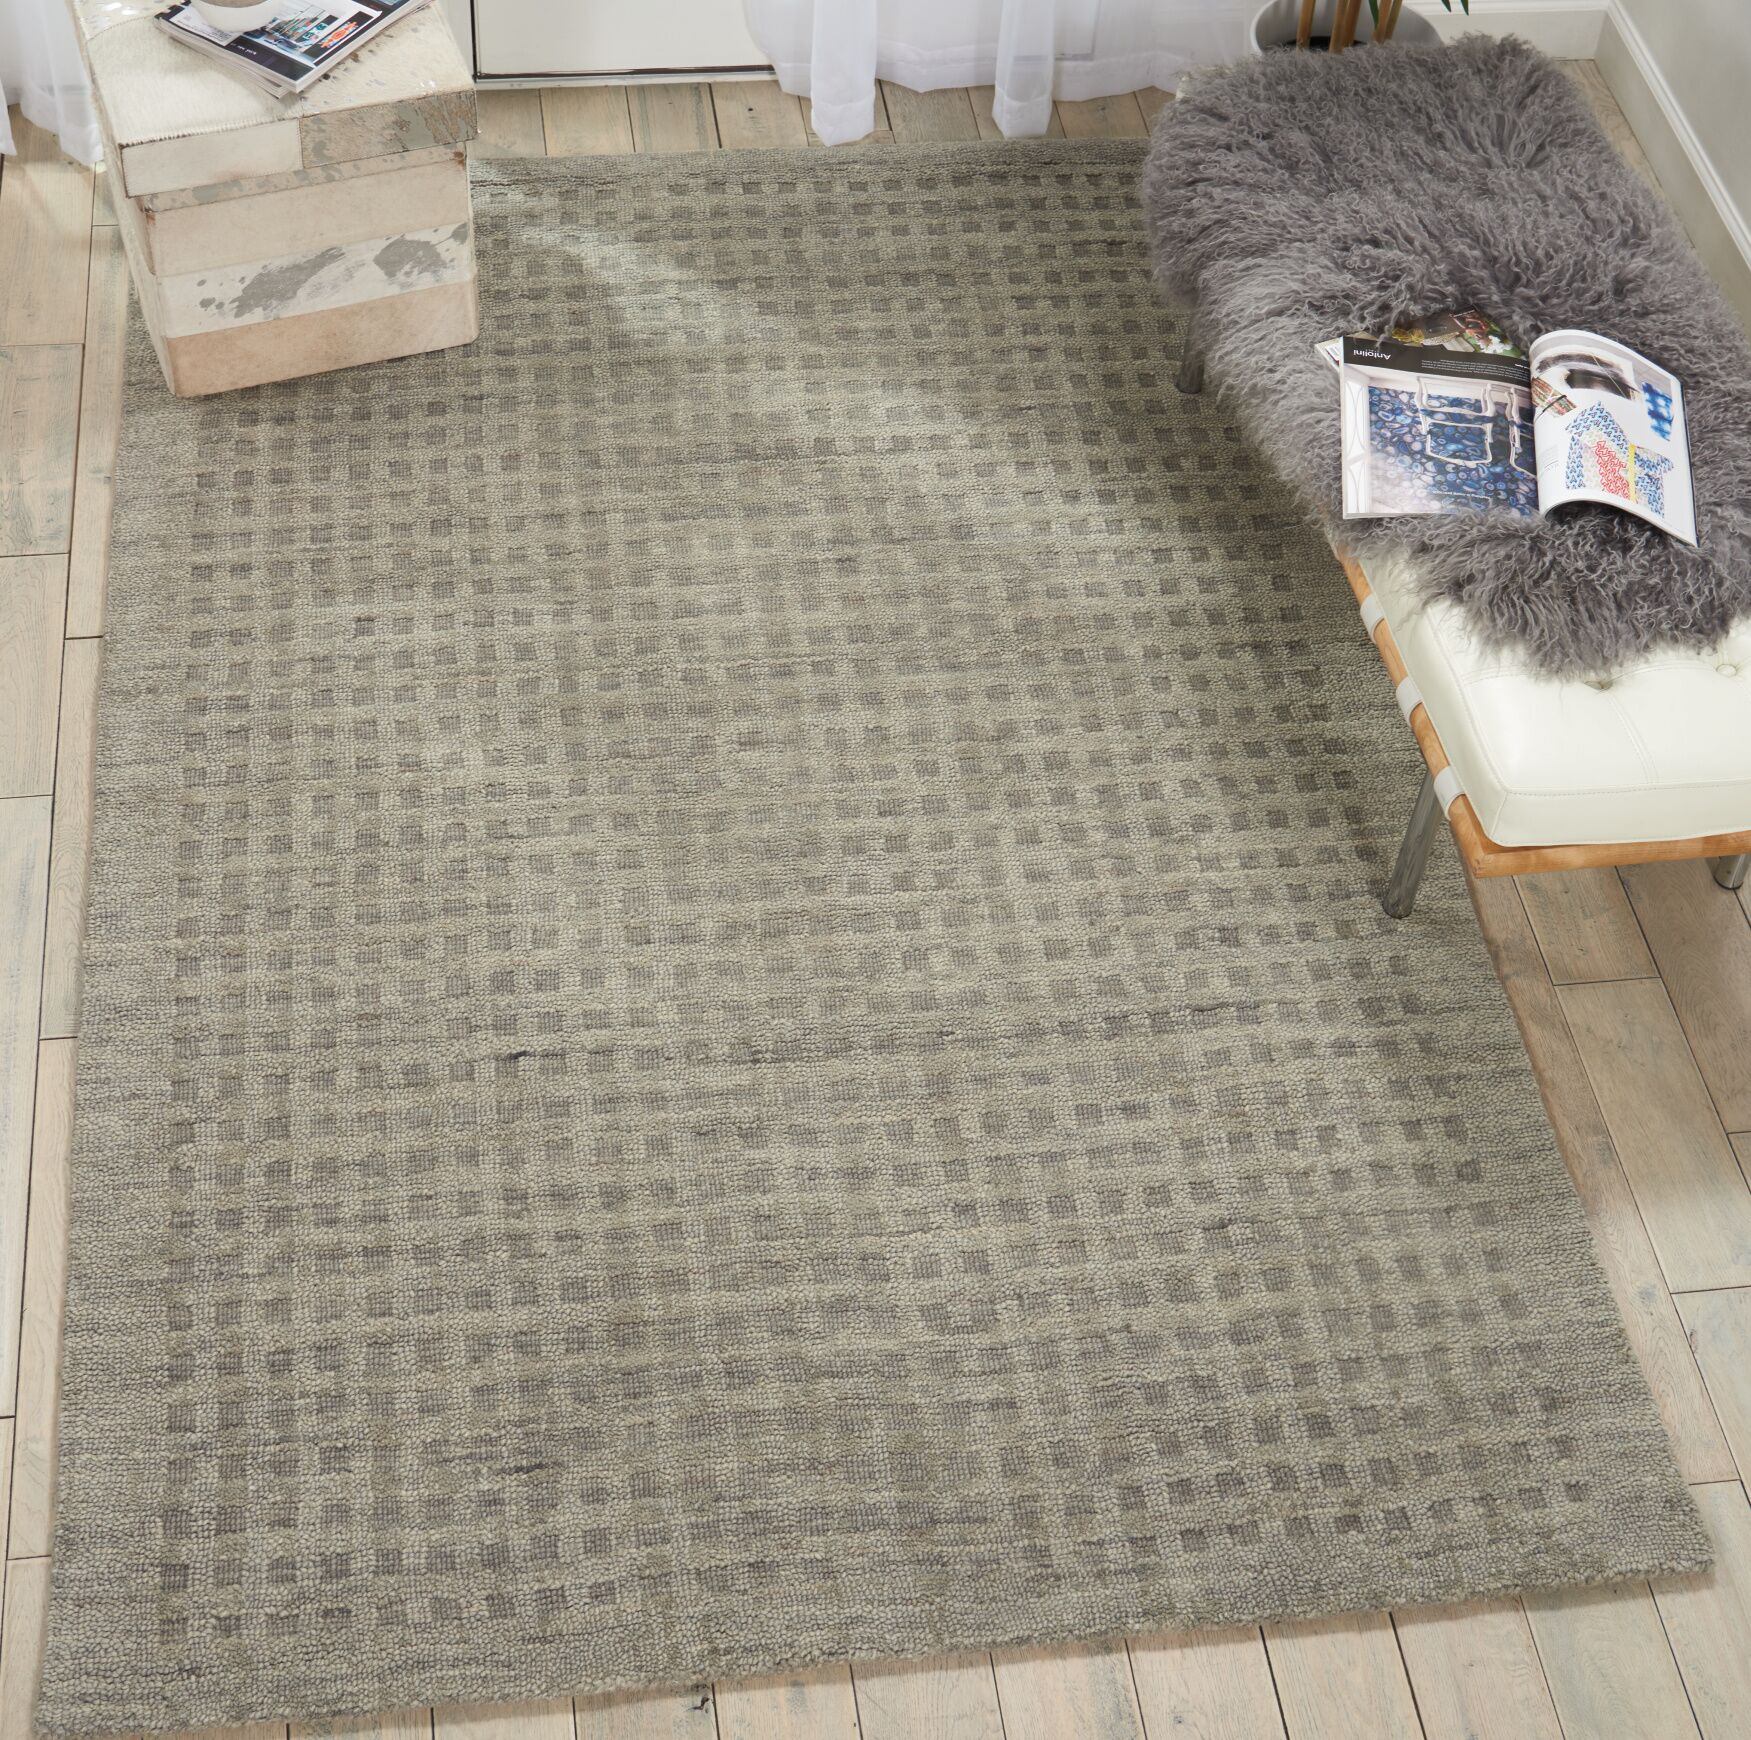 Dove Hand-Woven Wool Charcoal Gray Area Rug Rug Size: Rectangle 6'6